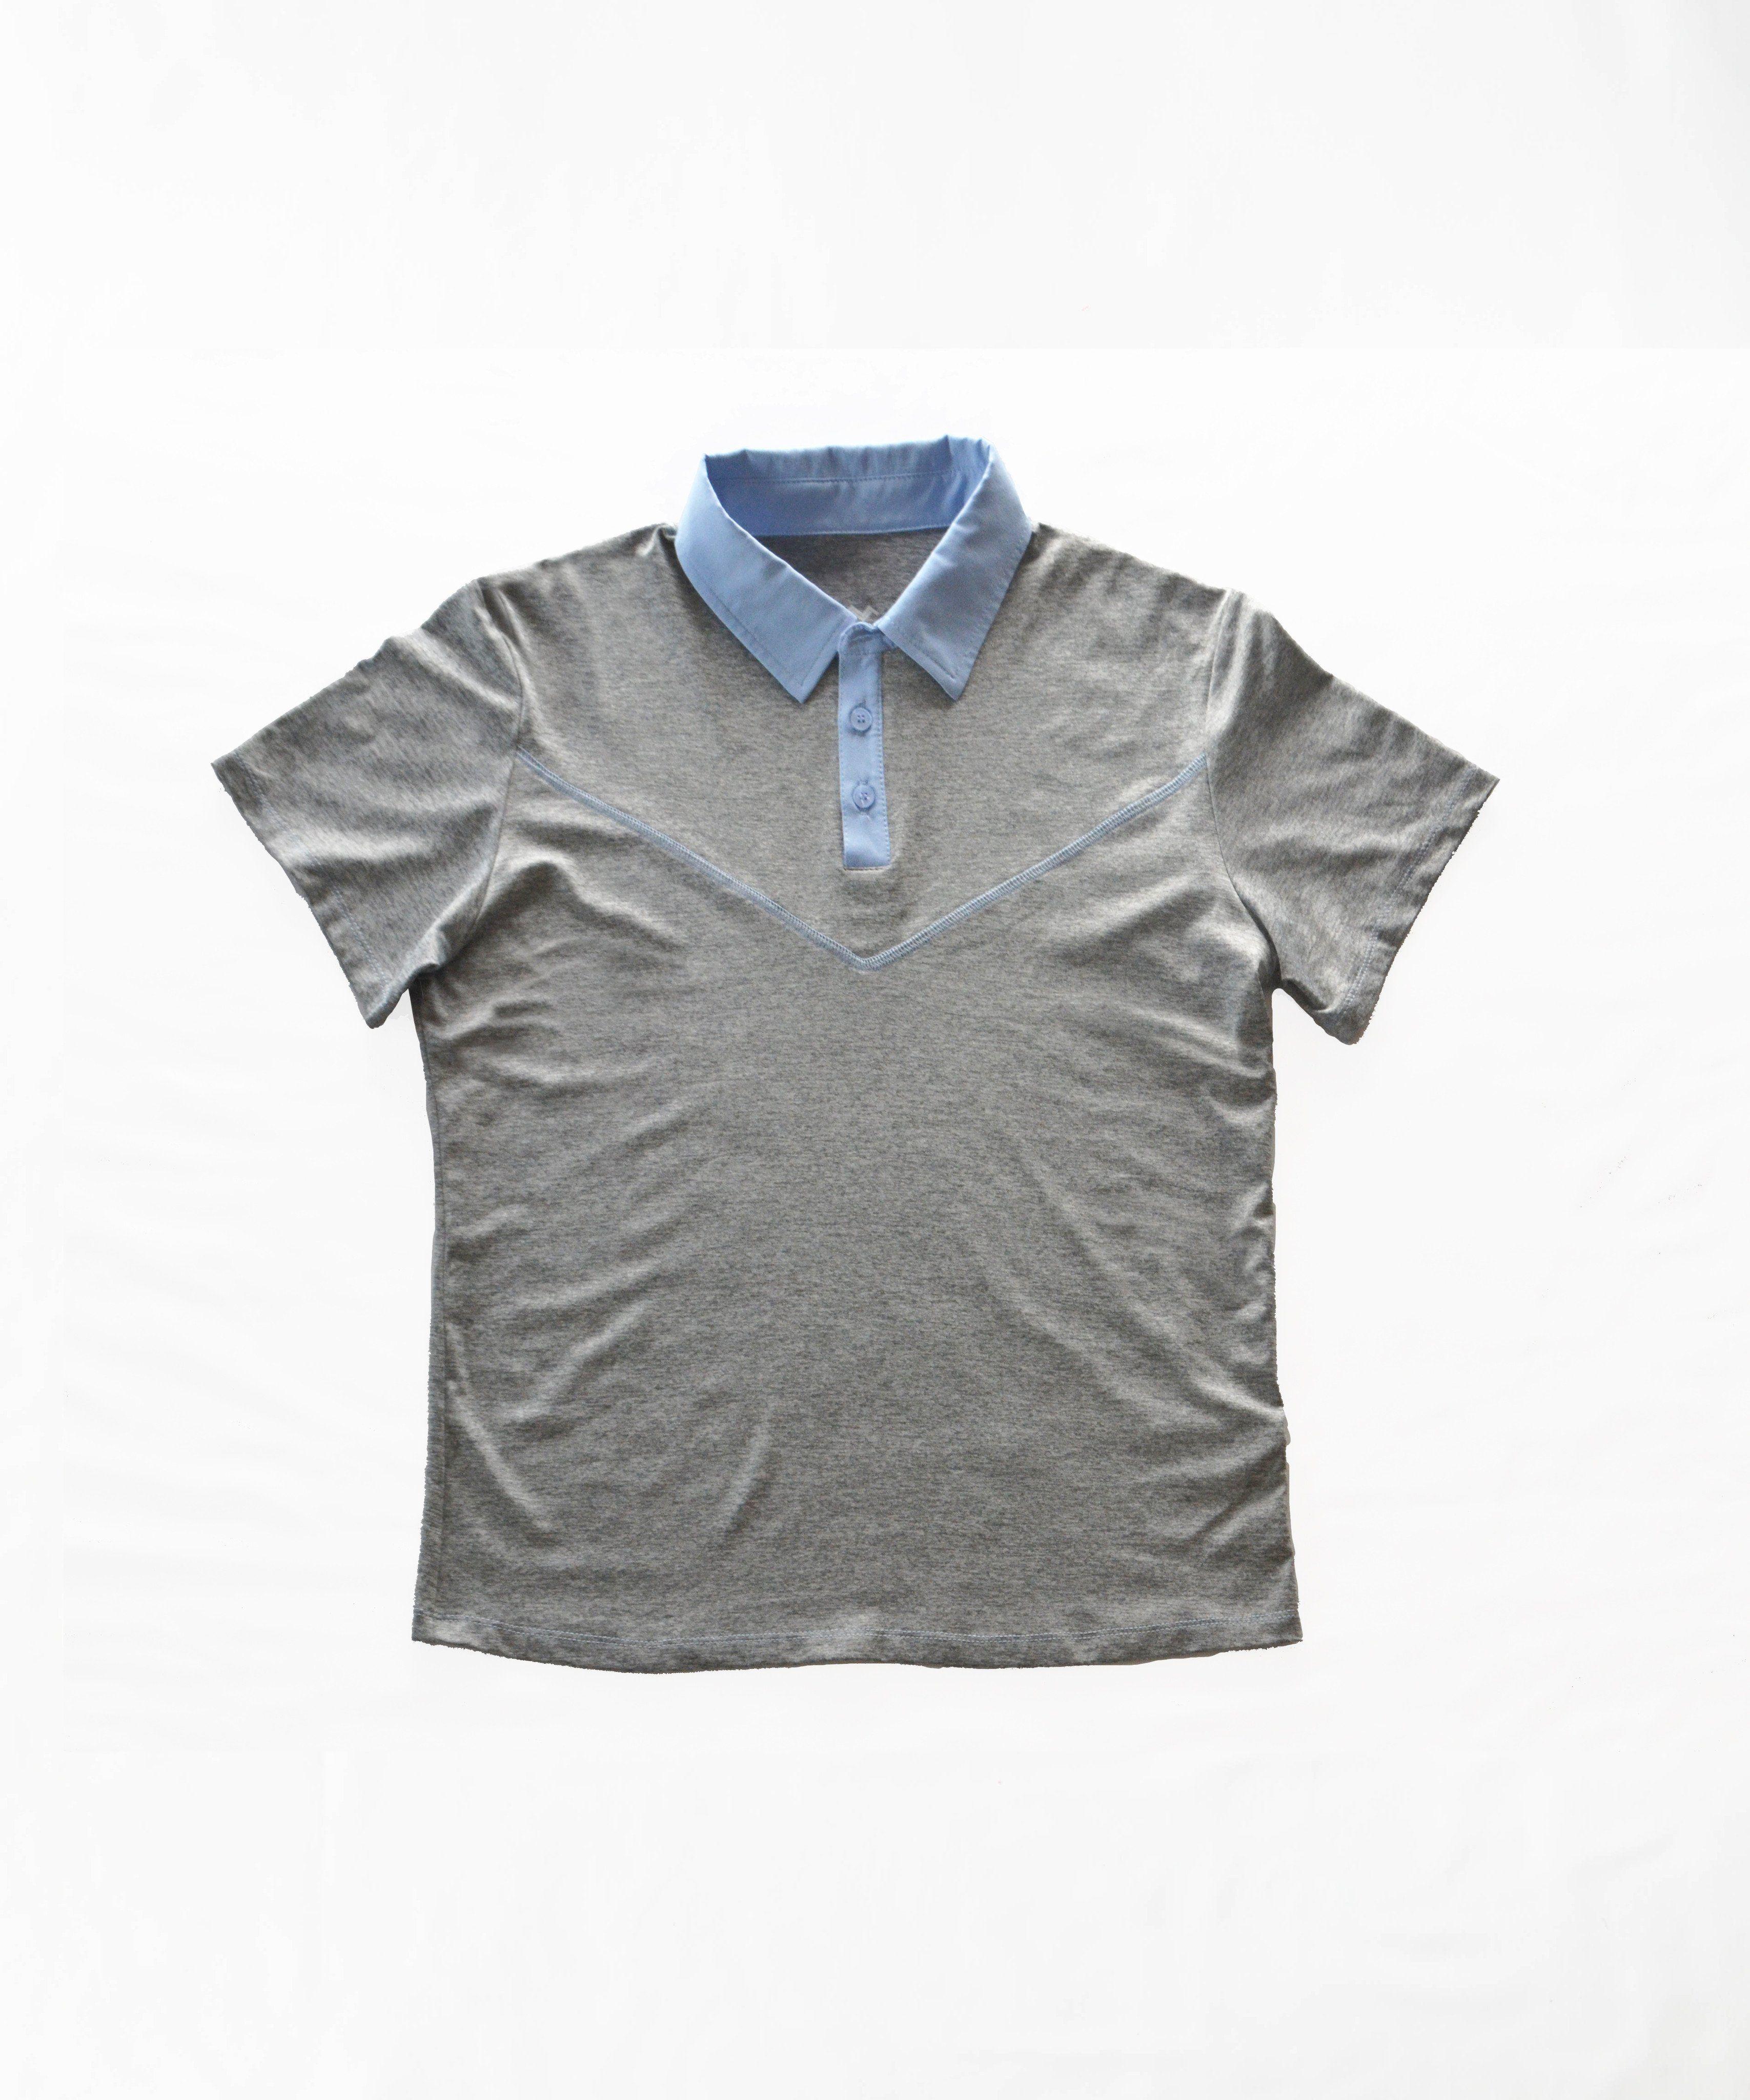 Golf Shirts Without Logos Capital Facility Management